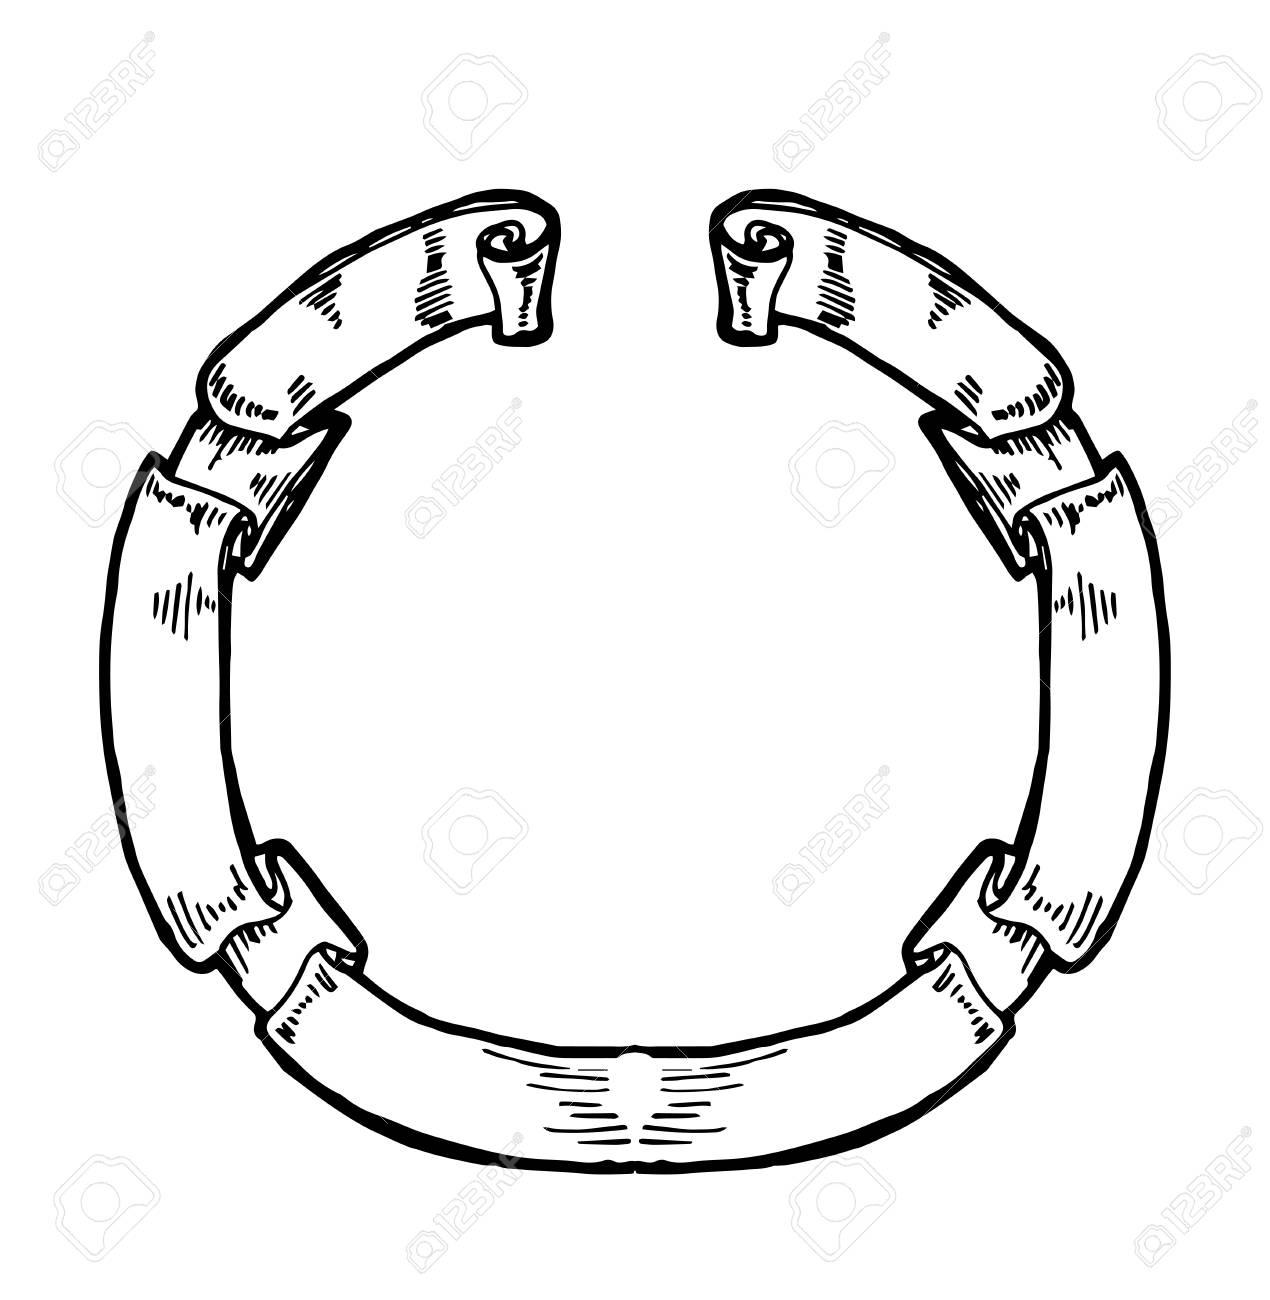 vintage circular ribbon banner hand drawn hand sketched element